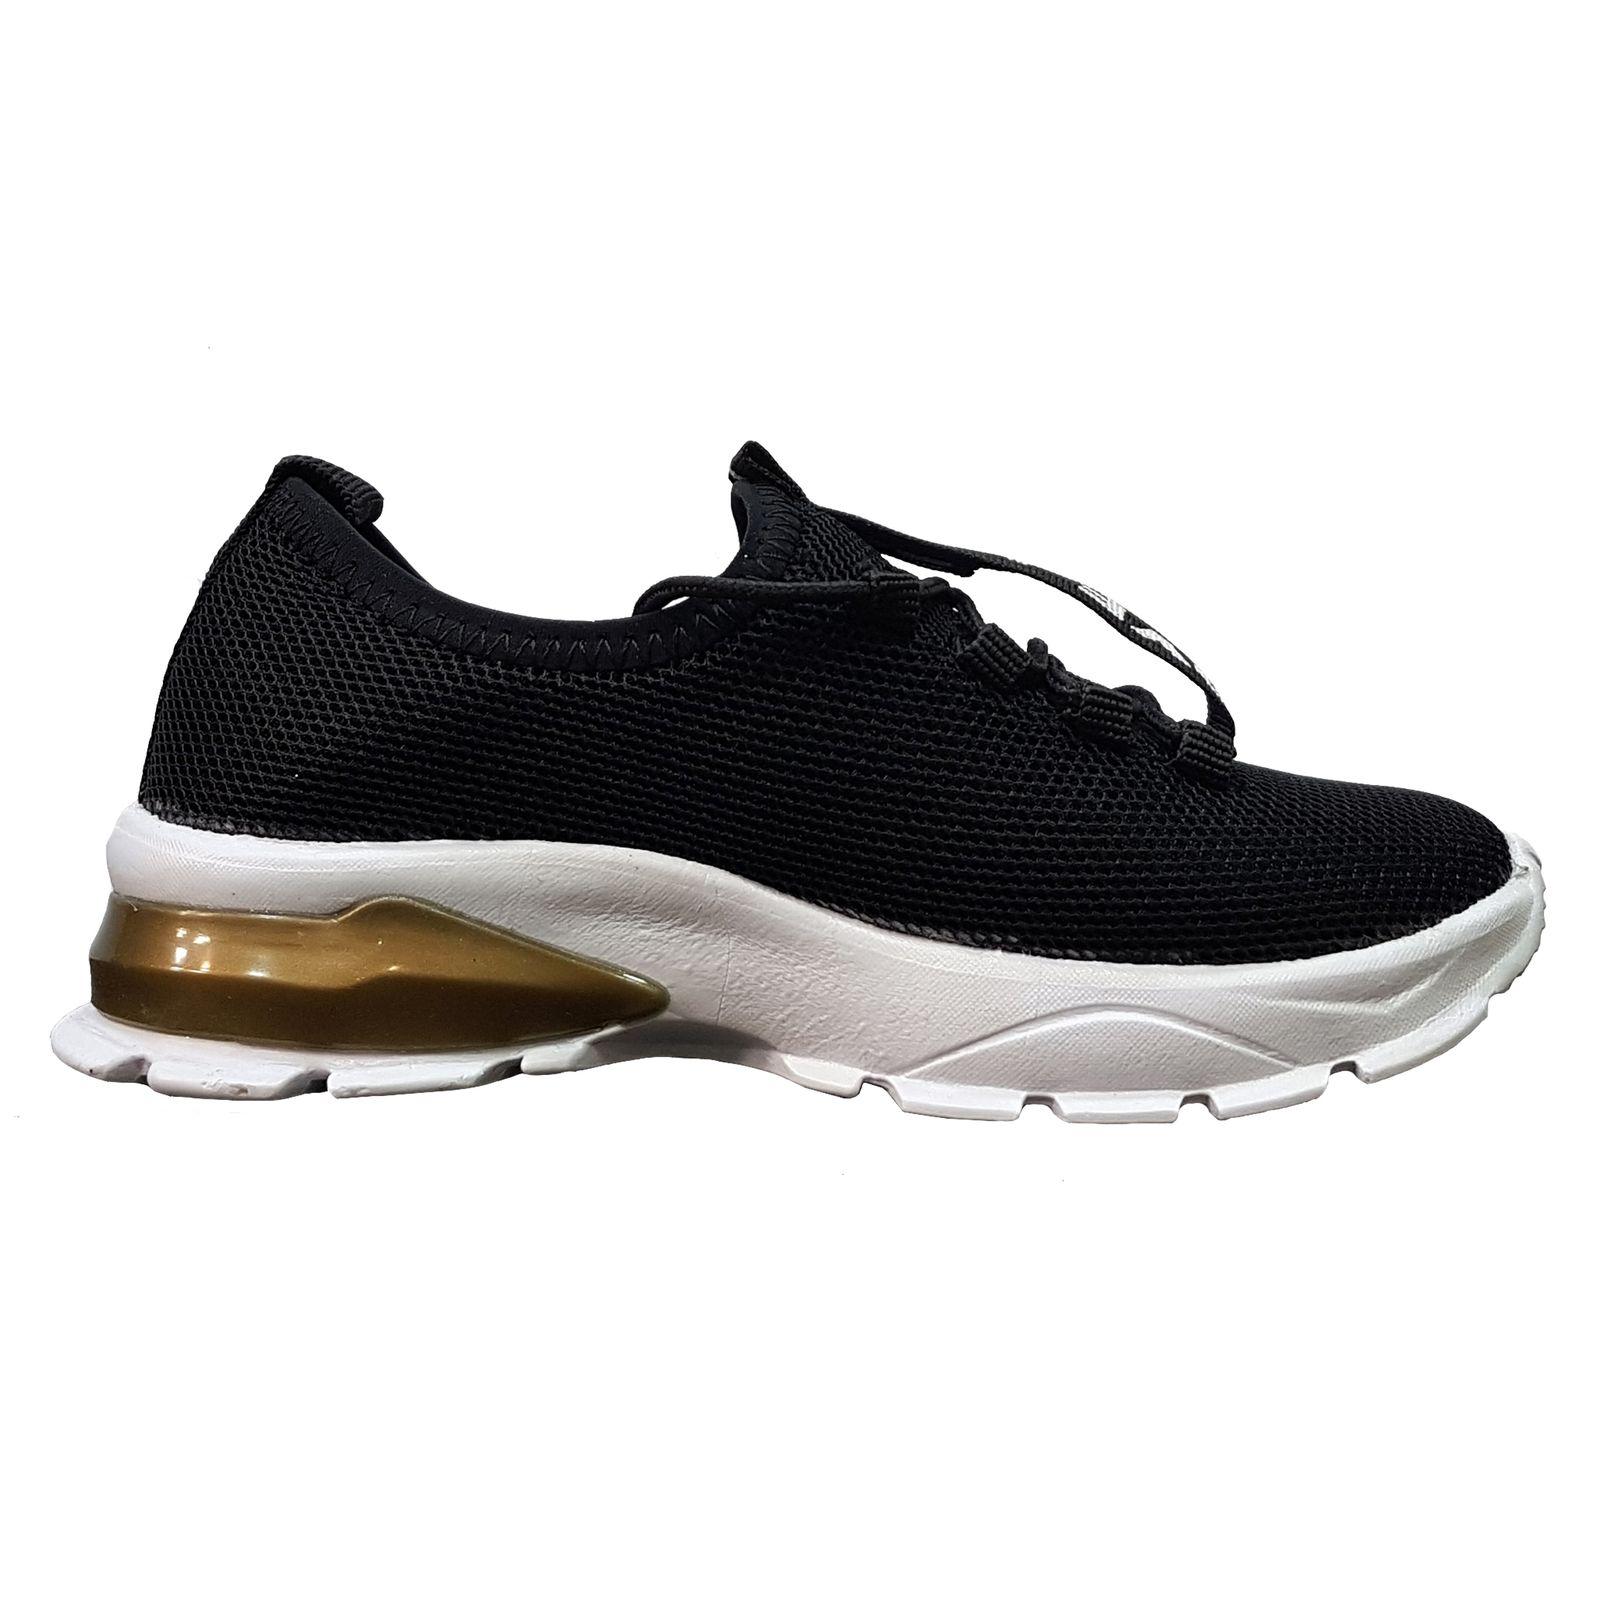 کفش پیاده روی پسرانه کد 3328129 -  - 4